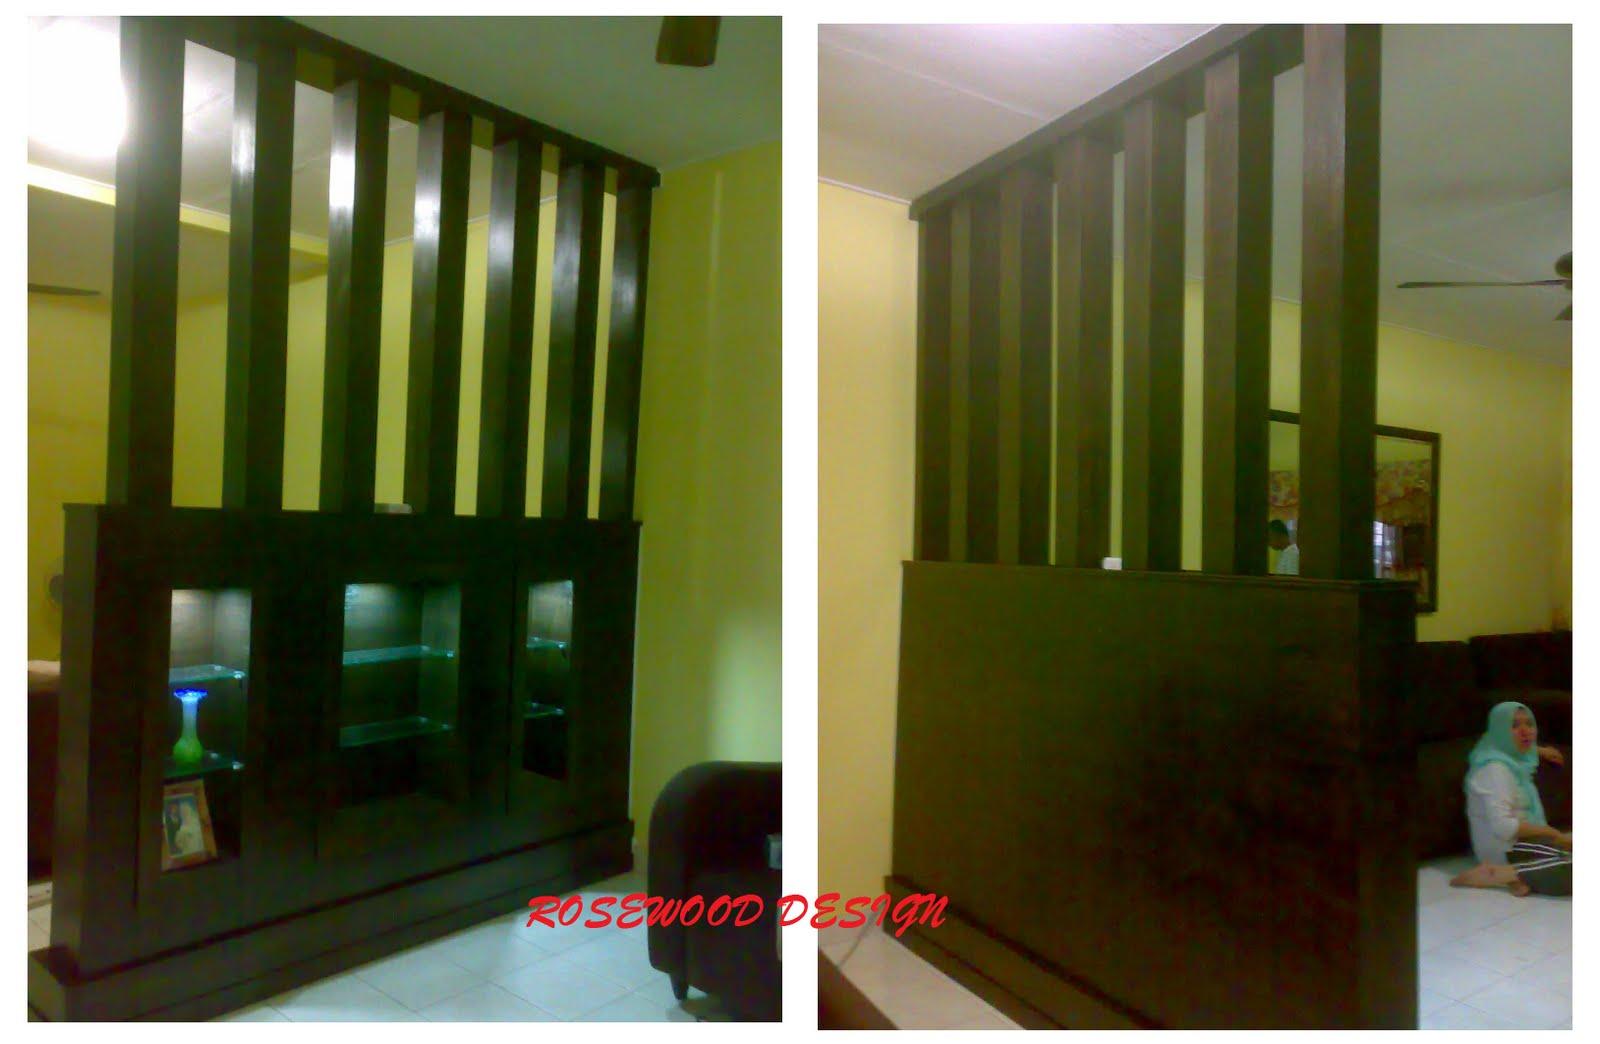 kitchen and living room dividing wall ideas afreakatheart. Black Bedroom Furniture Sets. Home Design Ideas